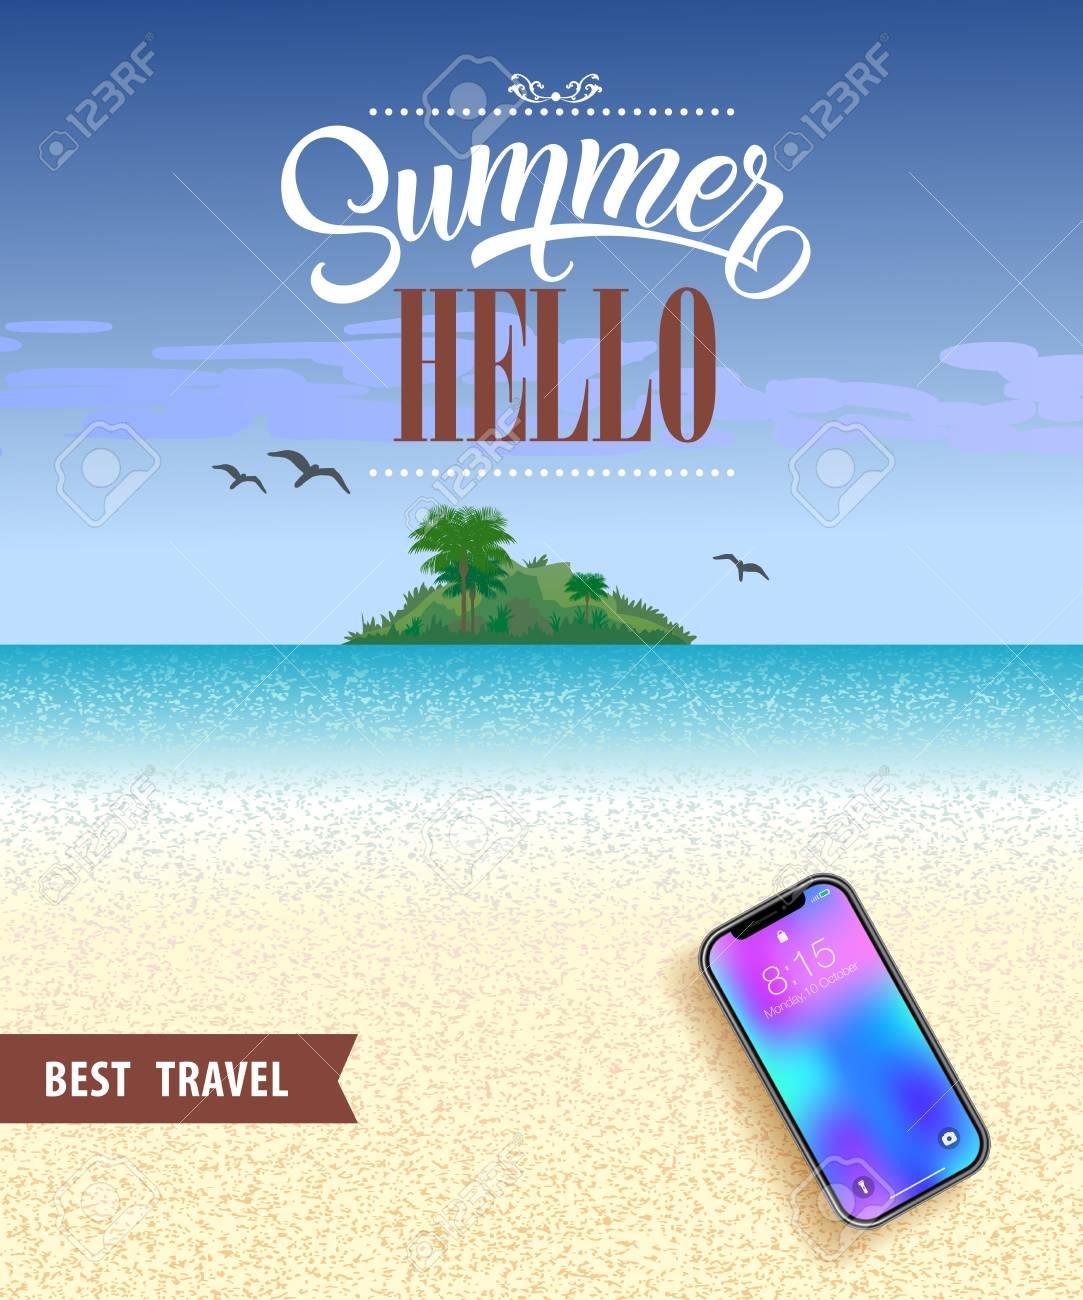 summer hello best travel poster design with ocean beach tropical